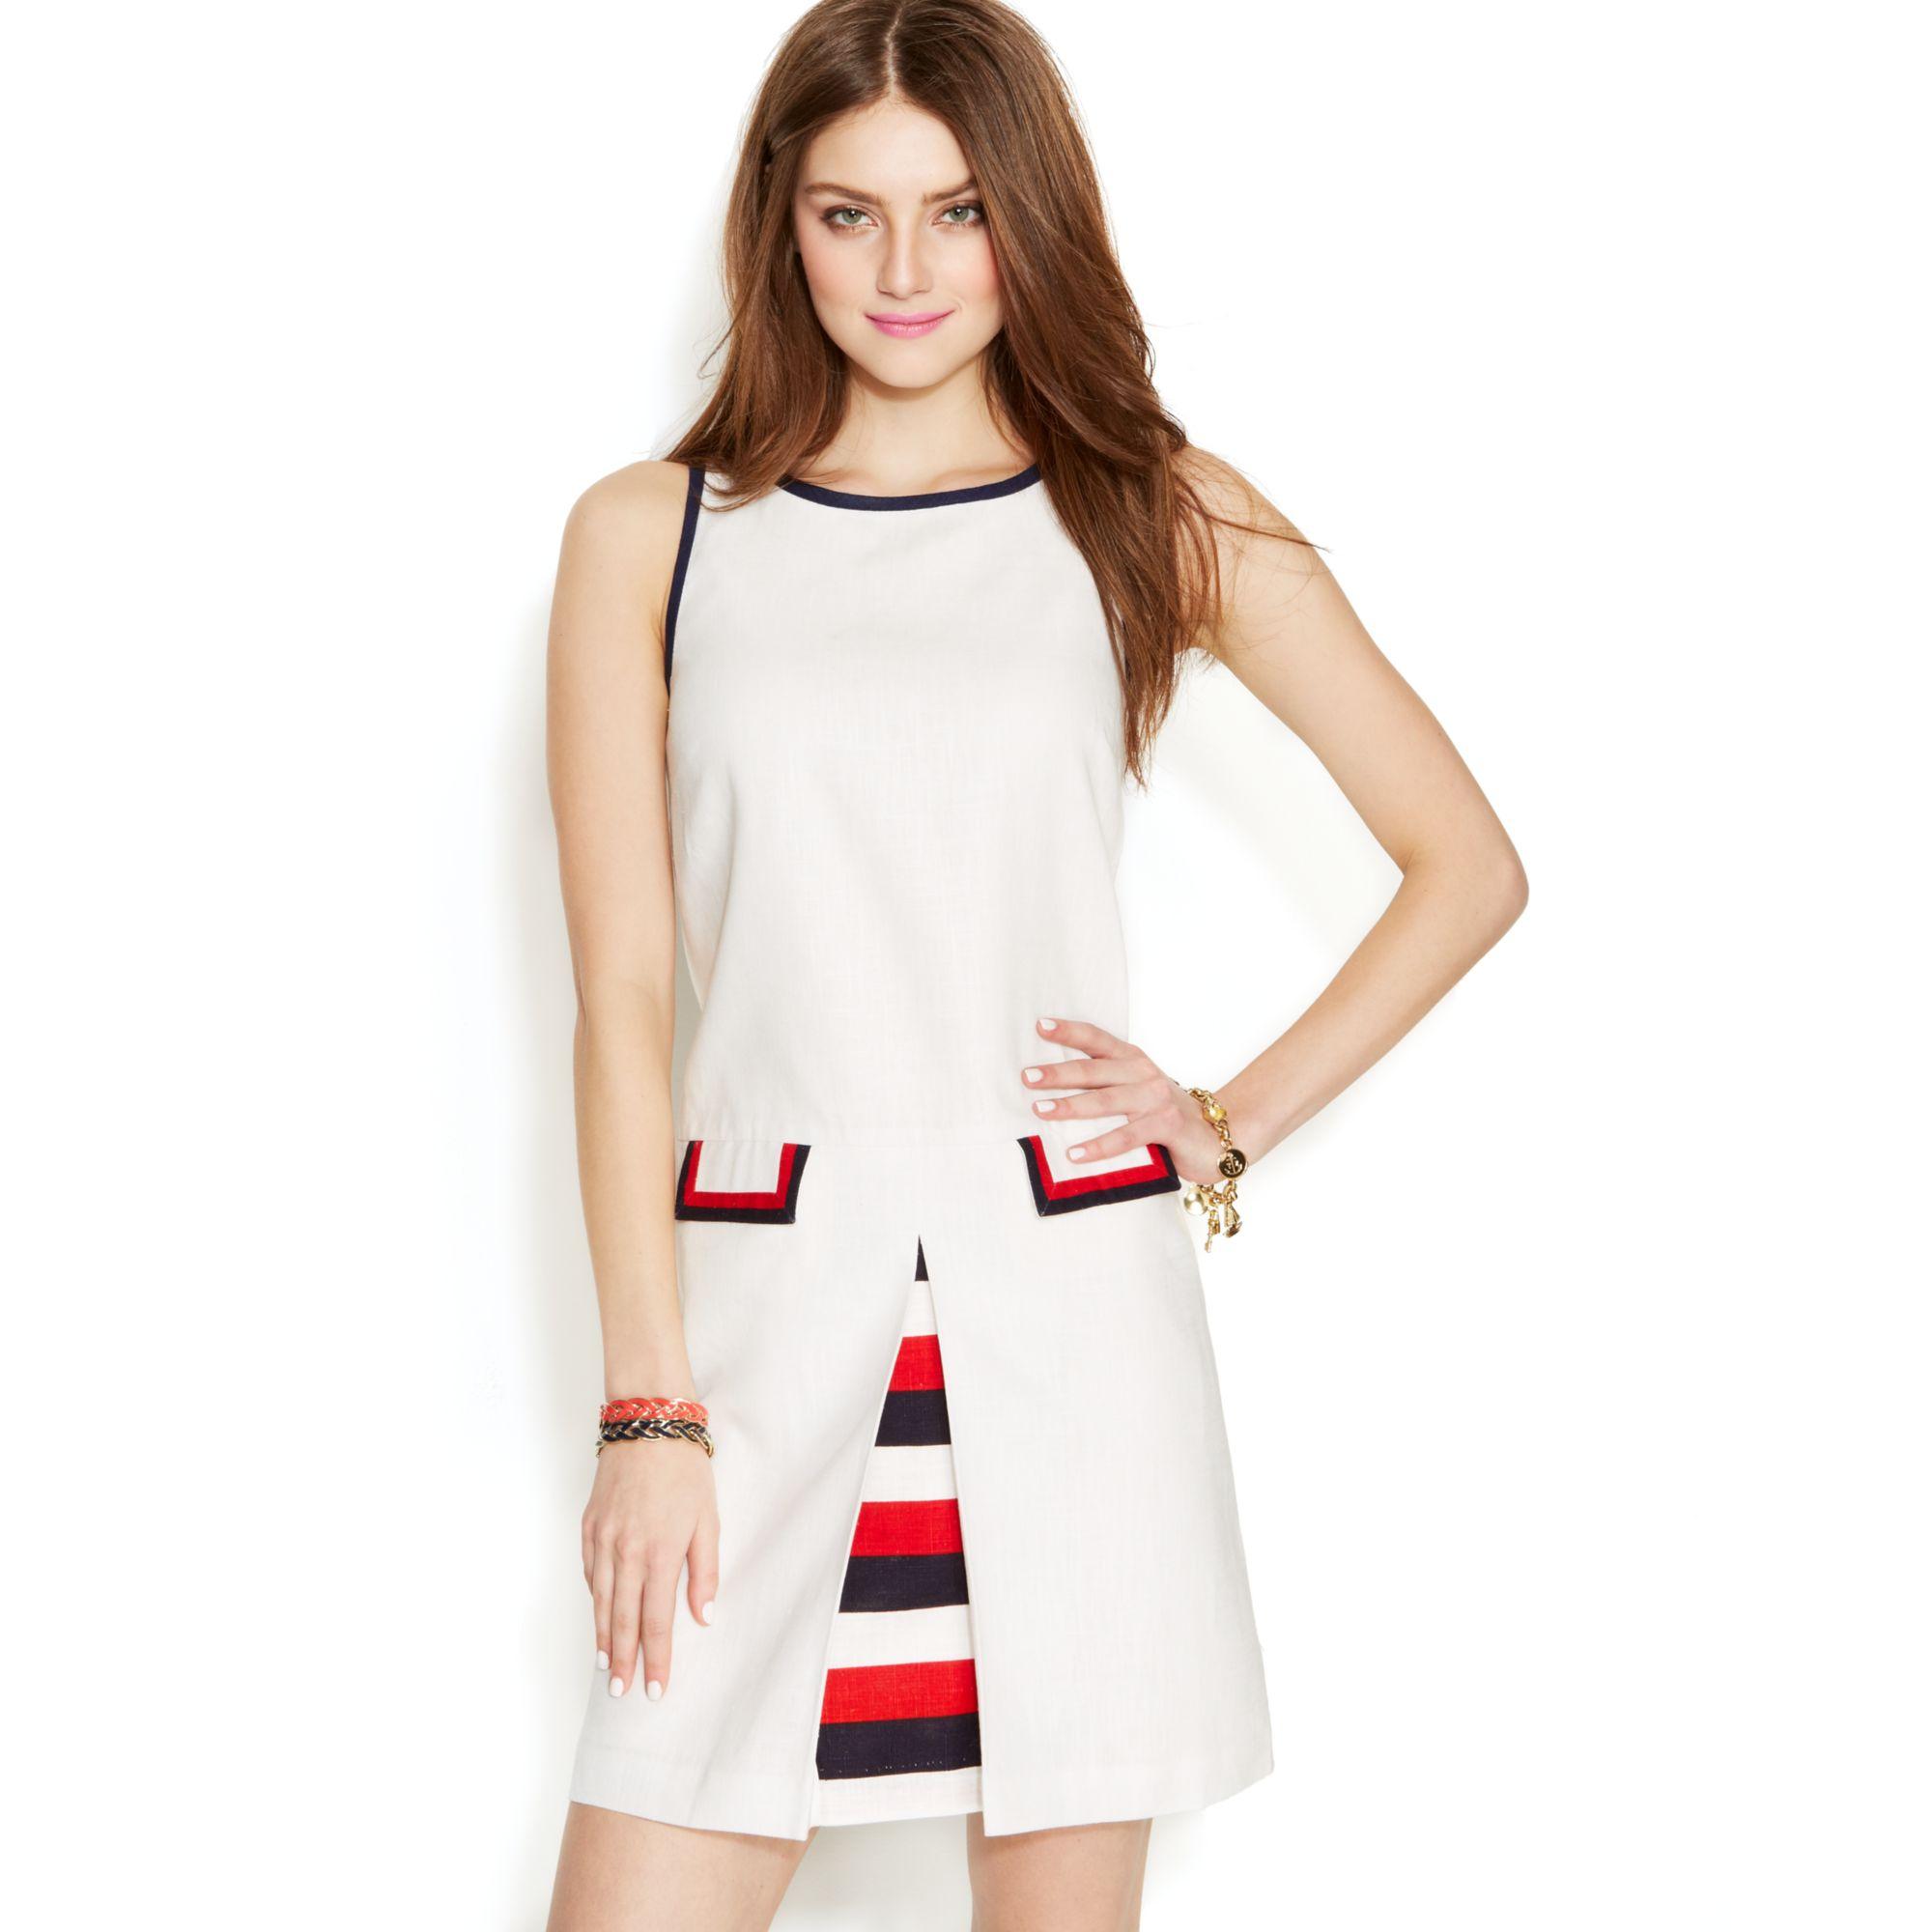 a3110735bad Tommy Hilfiger Zooey Deschanel For Invertedpleat Shift Dress in Red ...